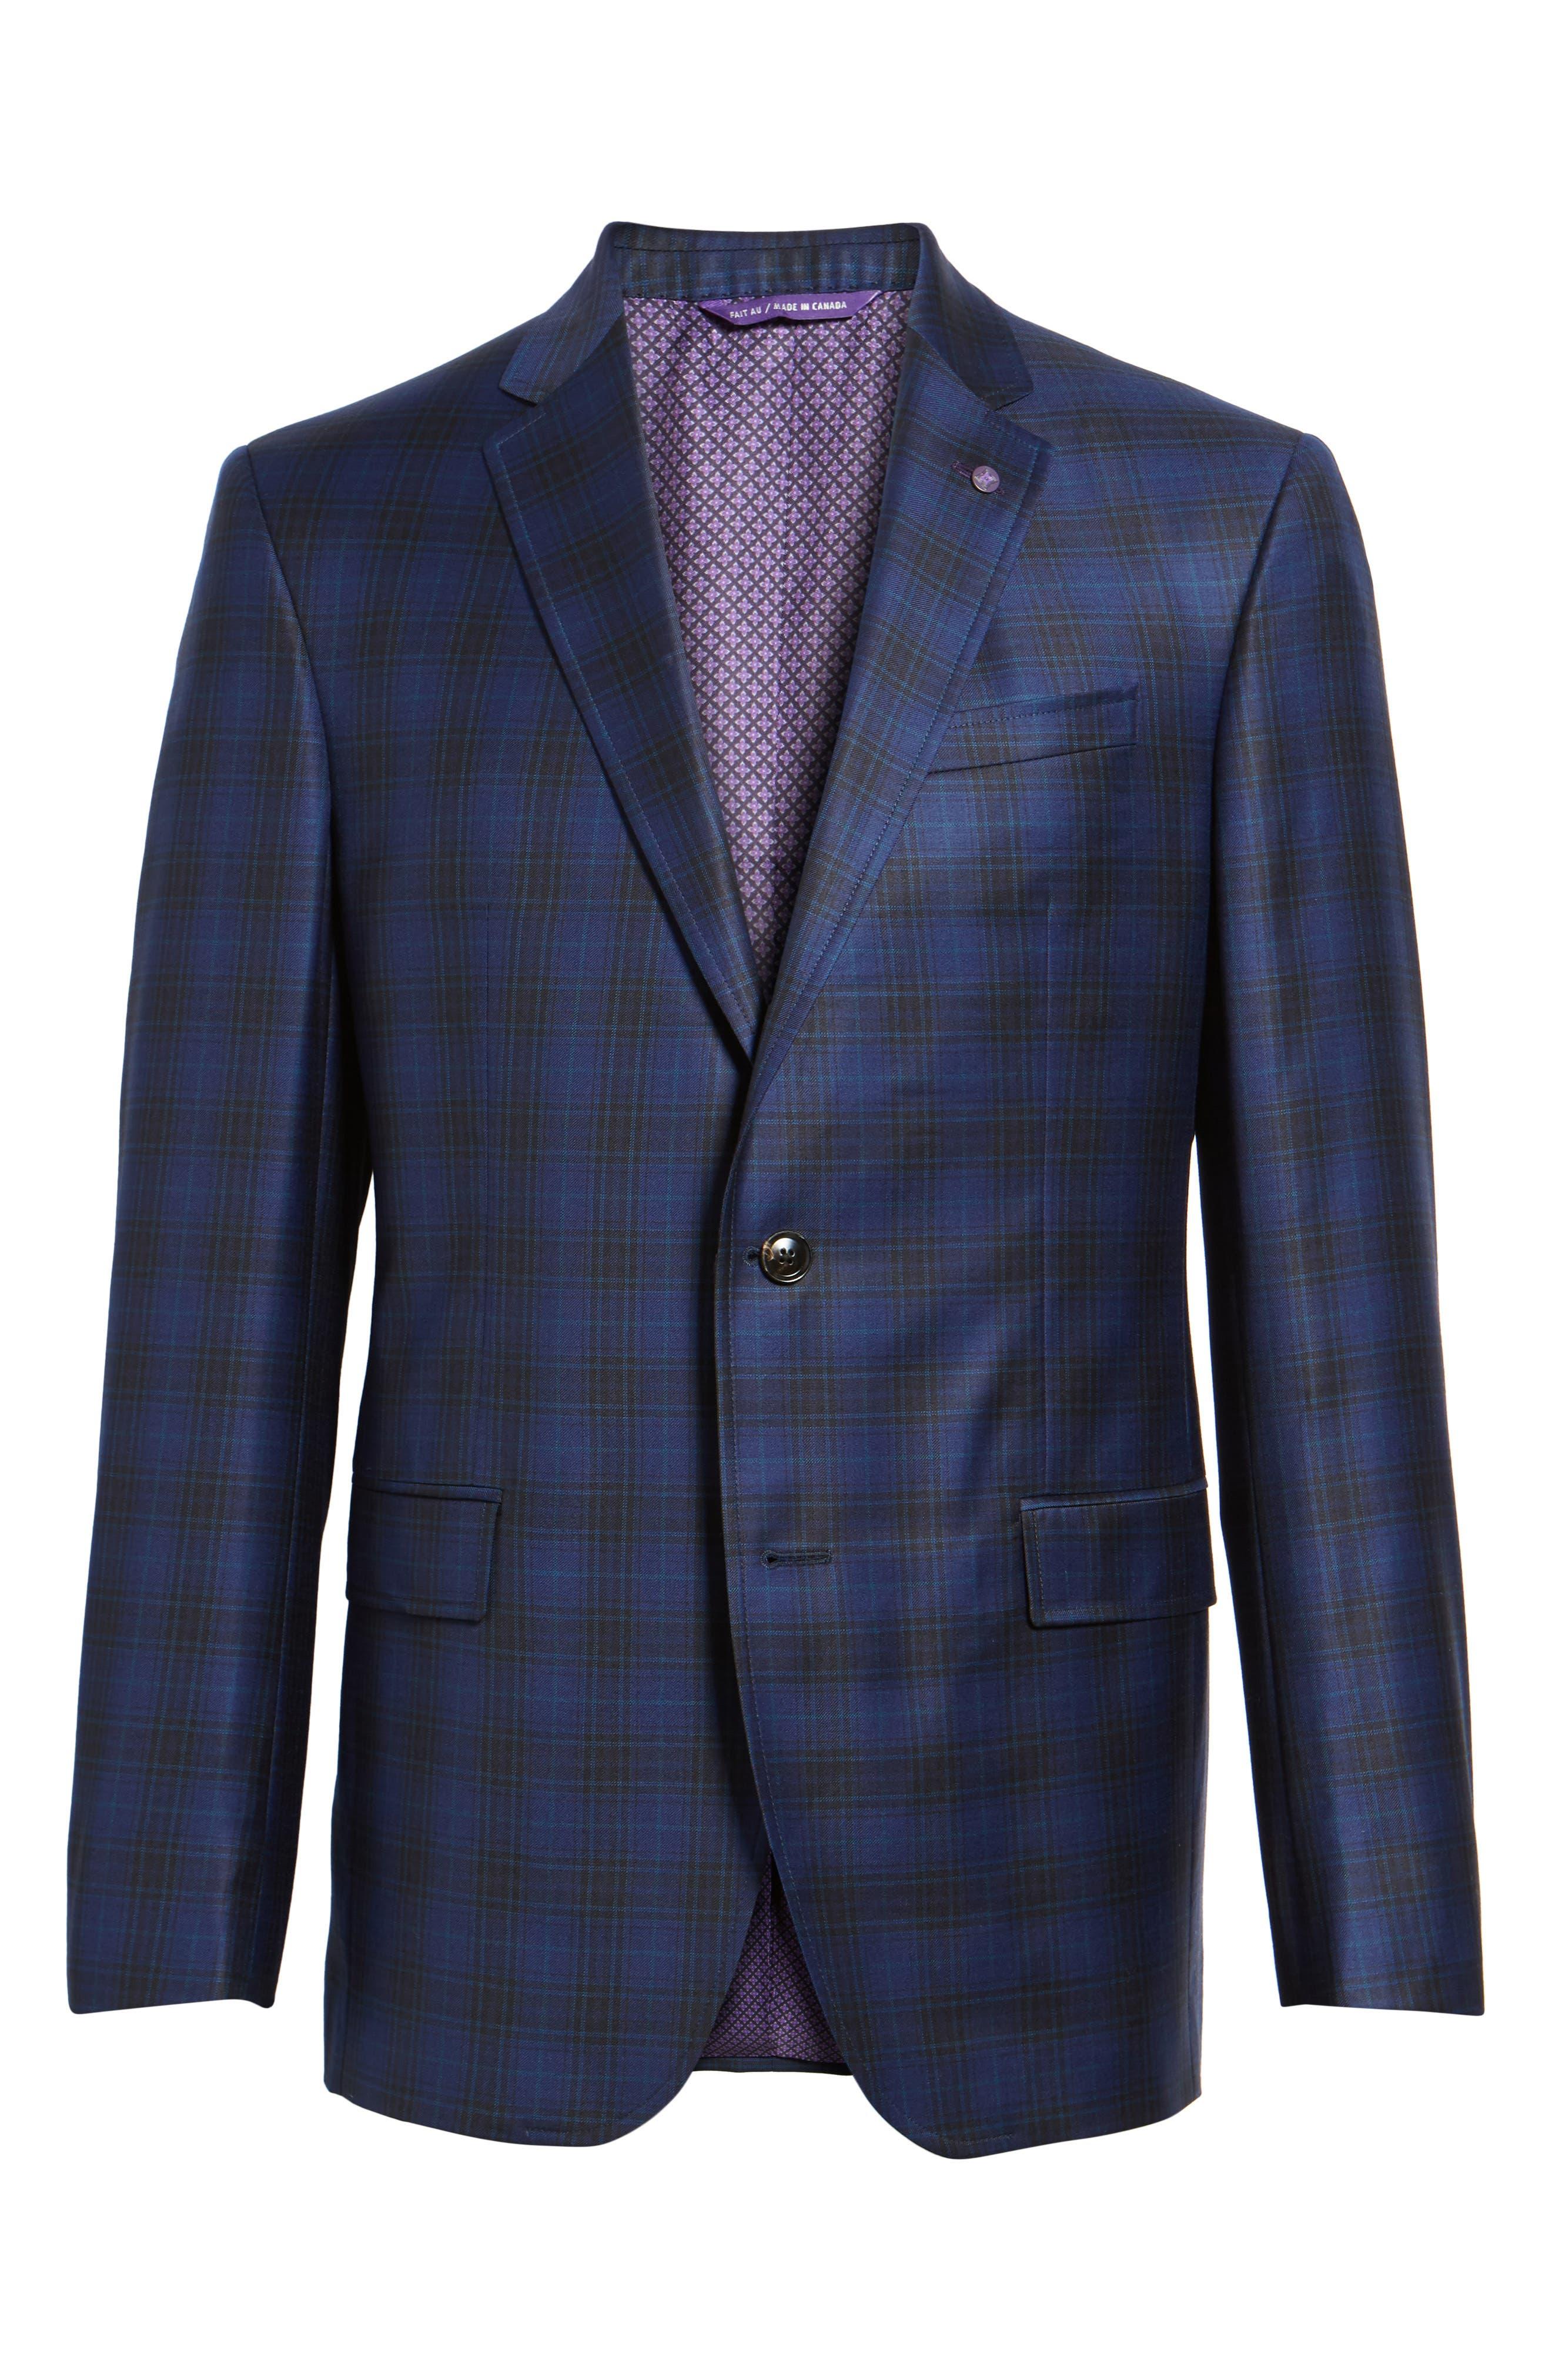 Jay Trim Fit Plaid Wool Sport Coat,                             Alternate thumbnail 6, color,                             Navy